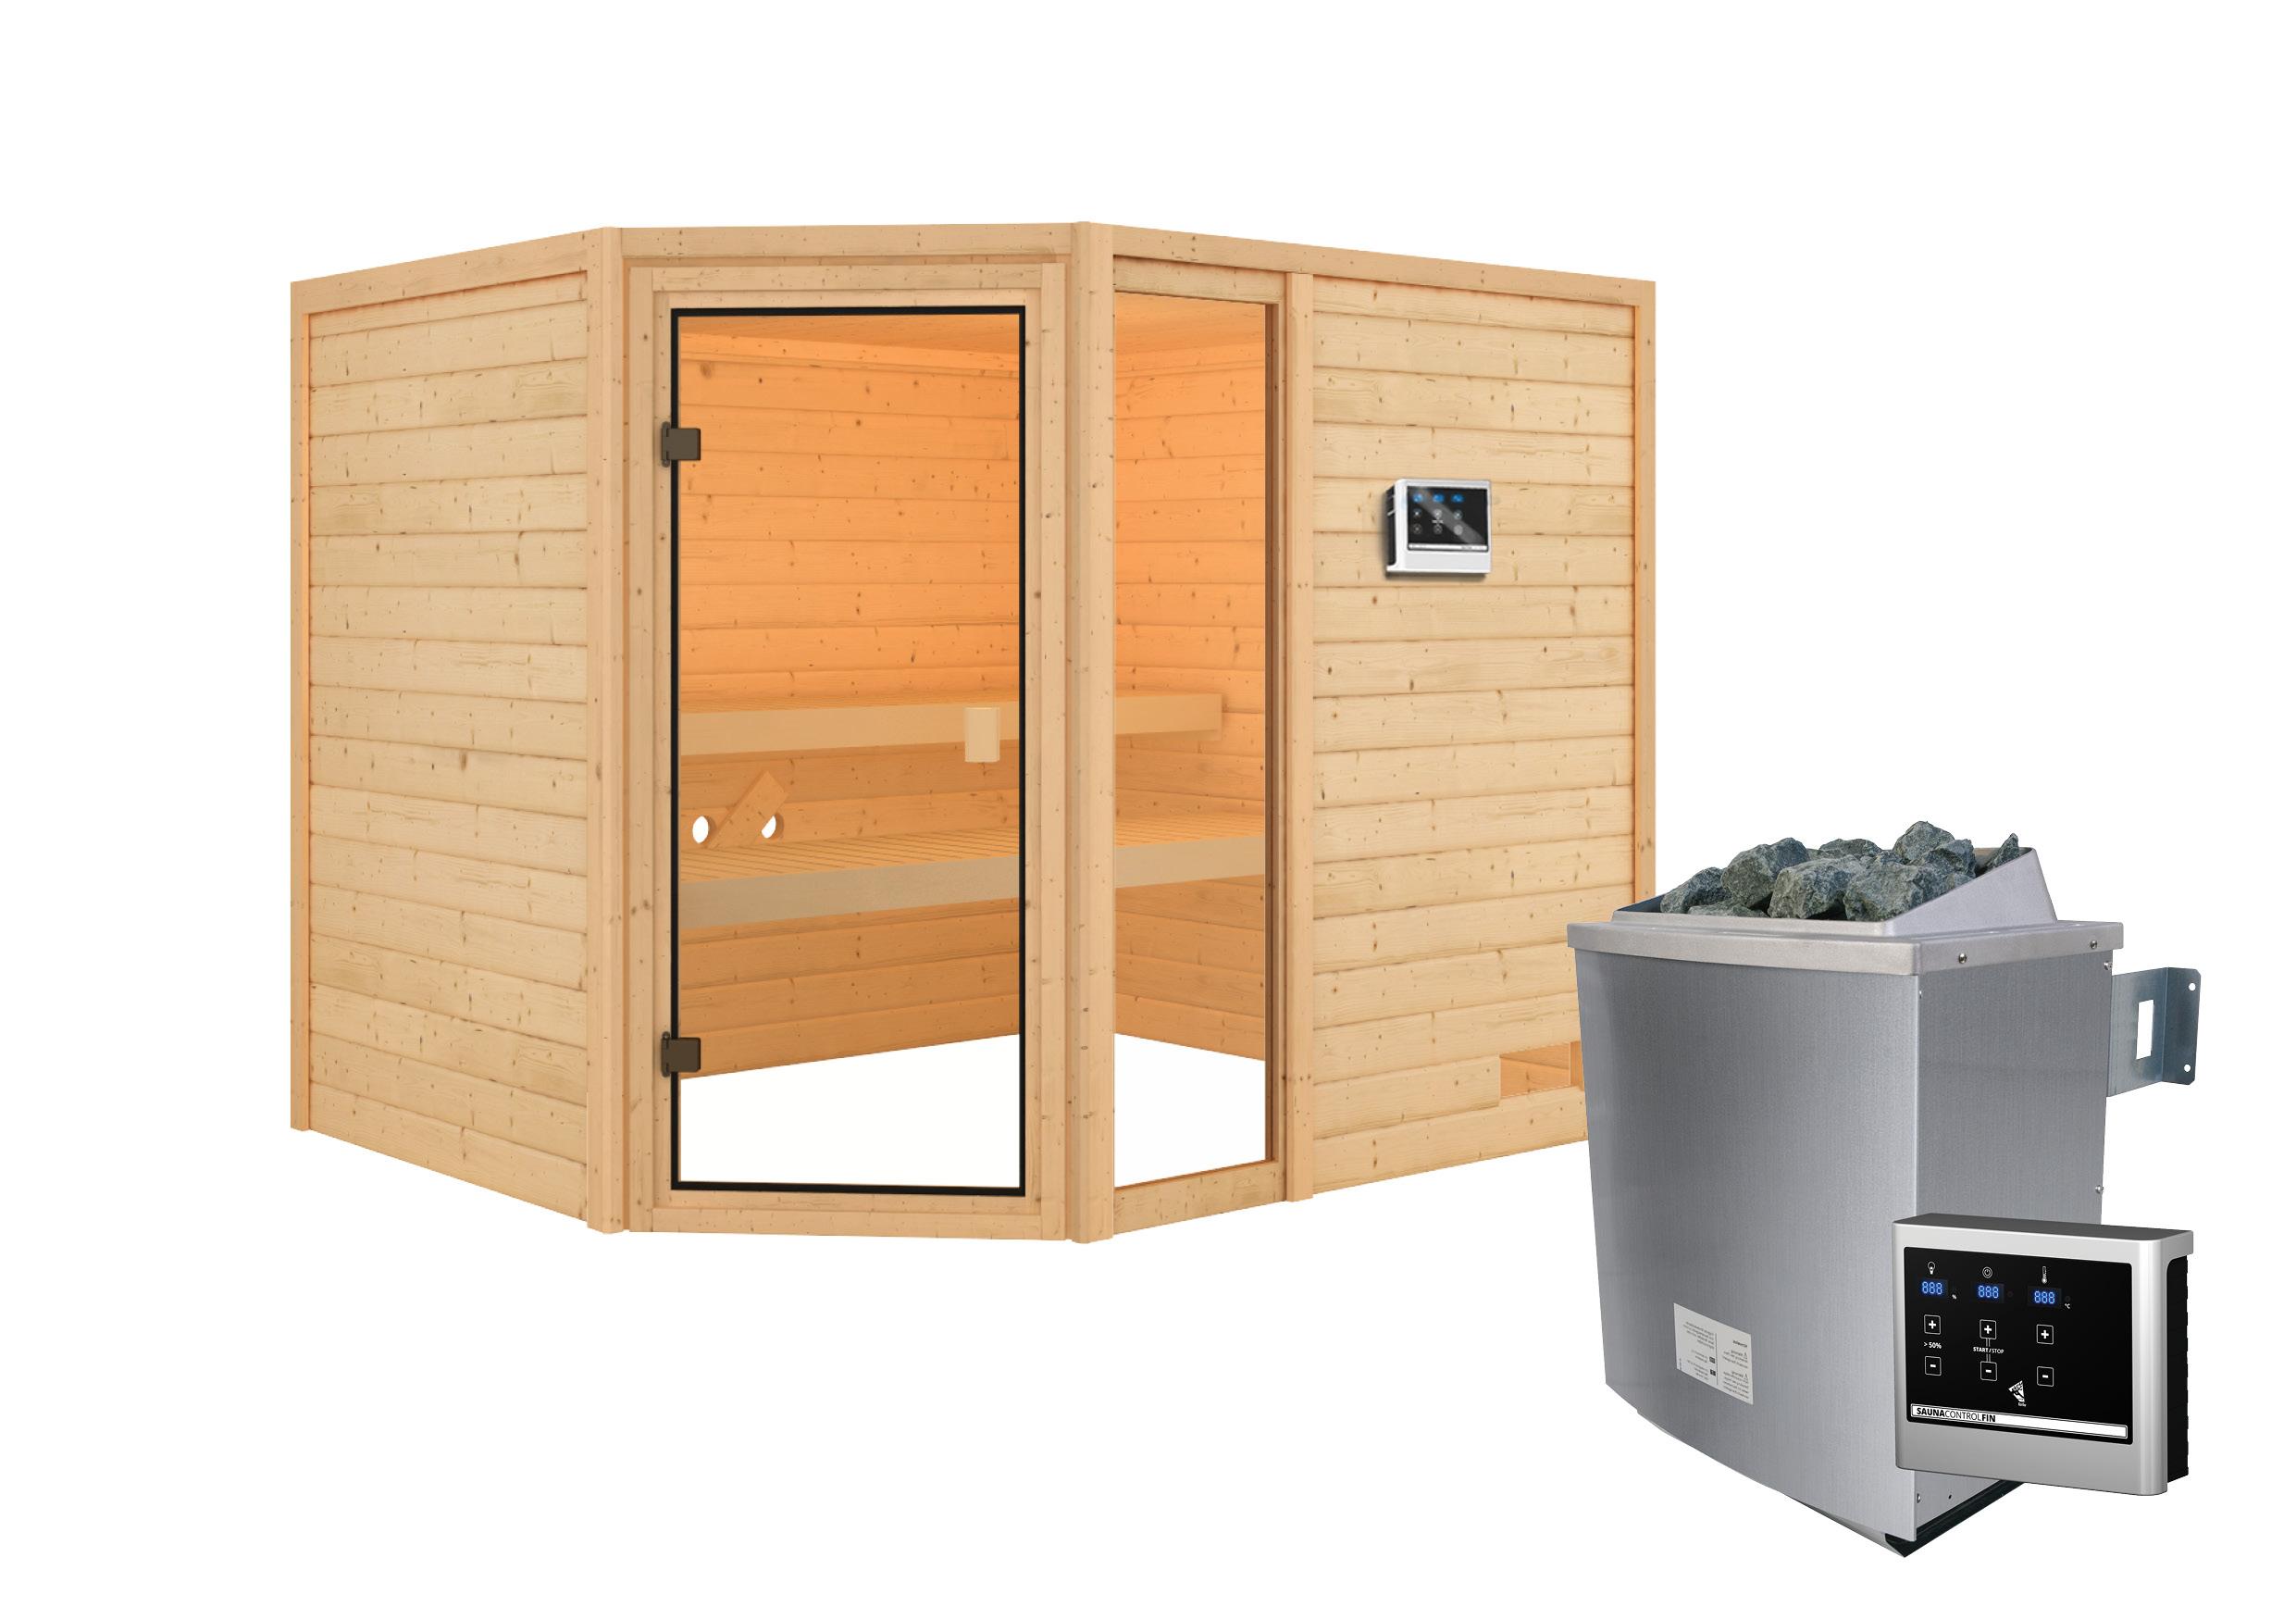 Woodfeeling Sauna Lola 38mm Saunaofen 9 kW extern Bild 9